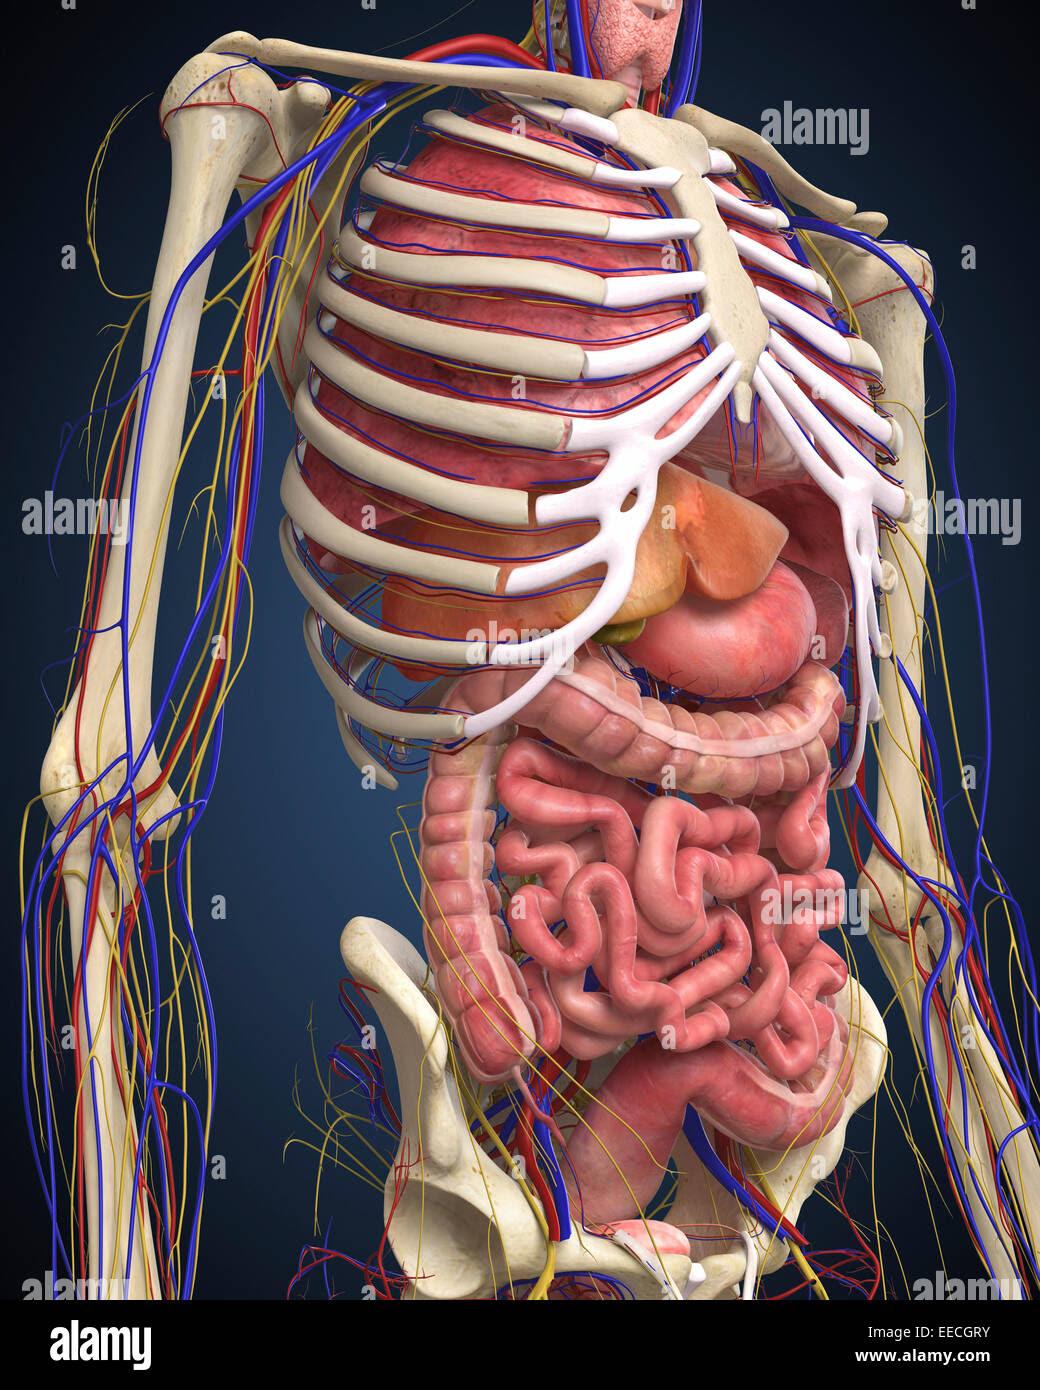 Rib Cage Diagram With Organs